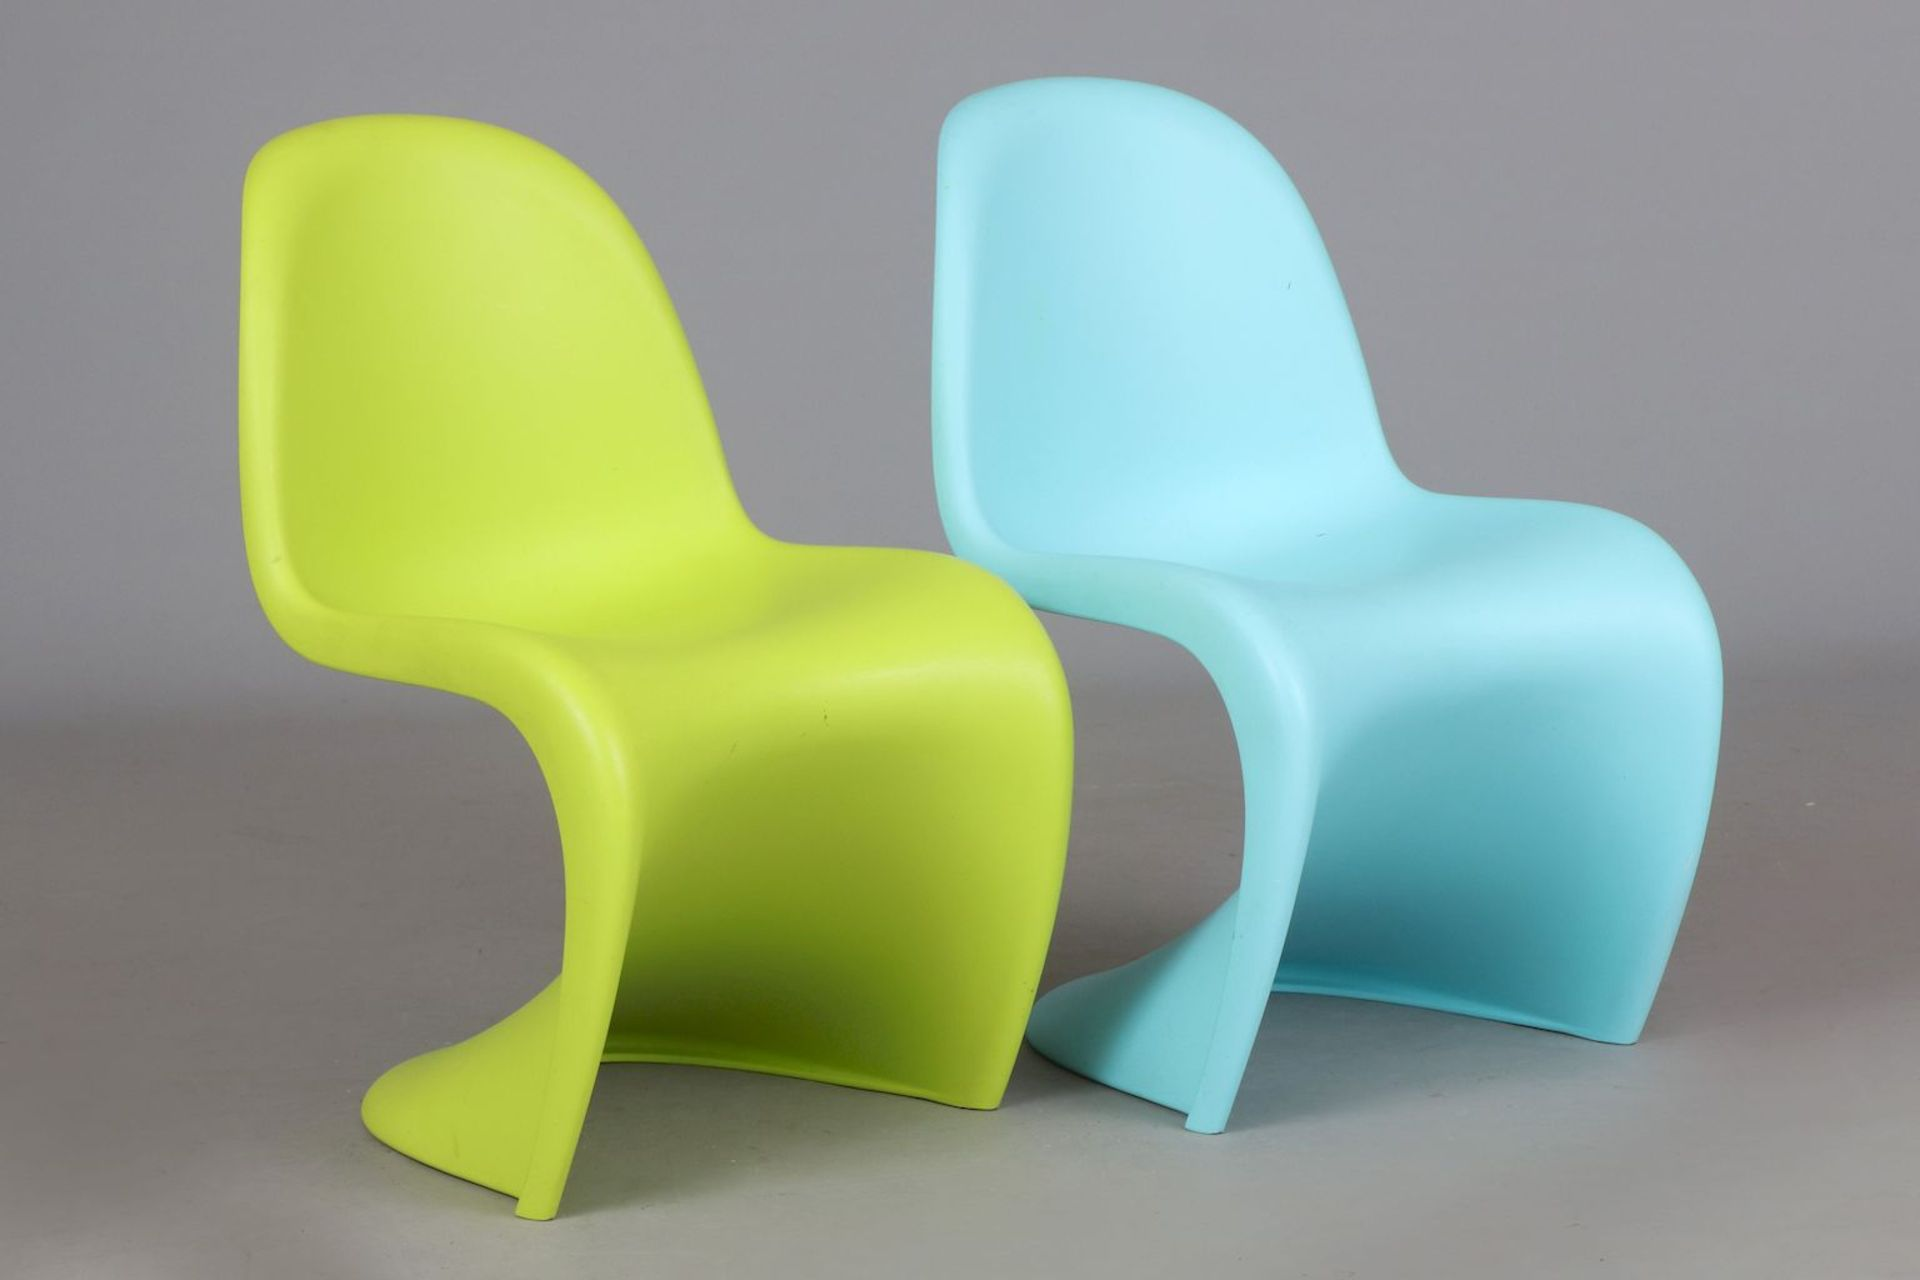 2 VERNER PANTON Kinder (Junior) ¨Panton Chairs¨ - Image 3 of 5